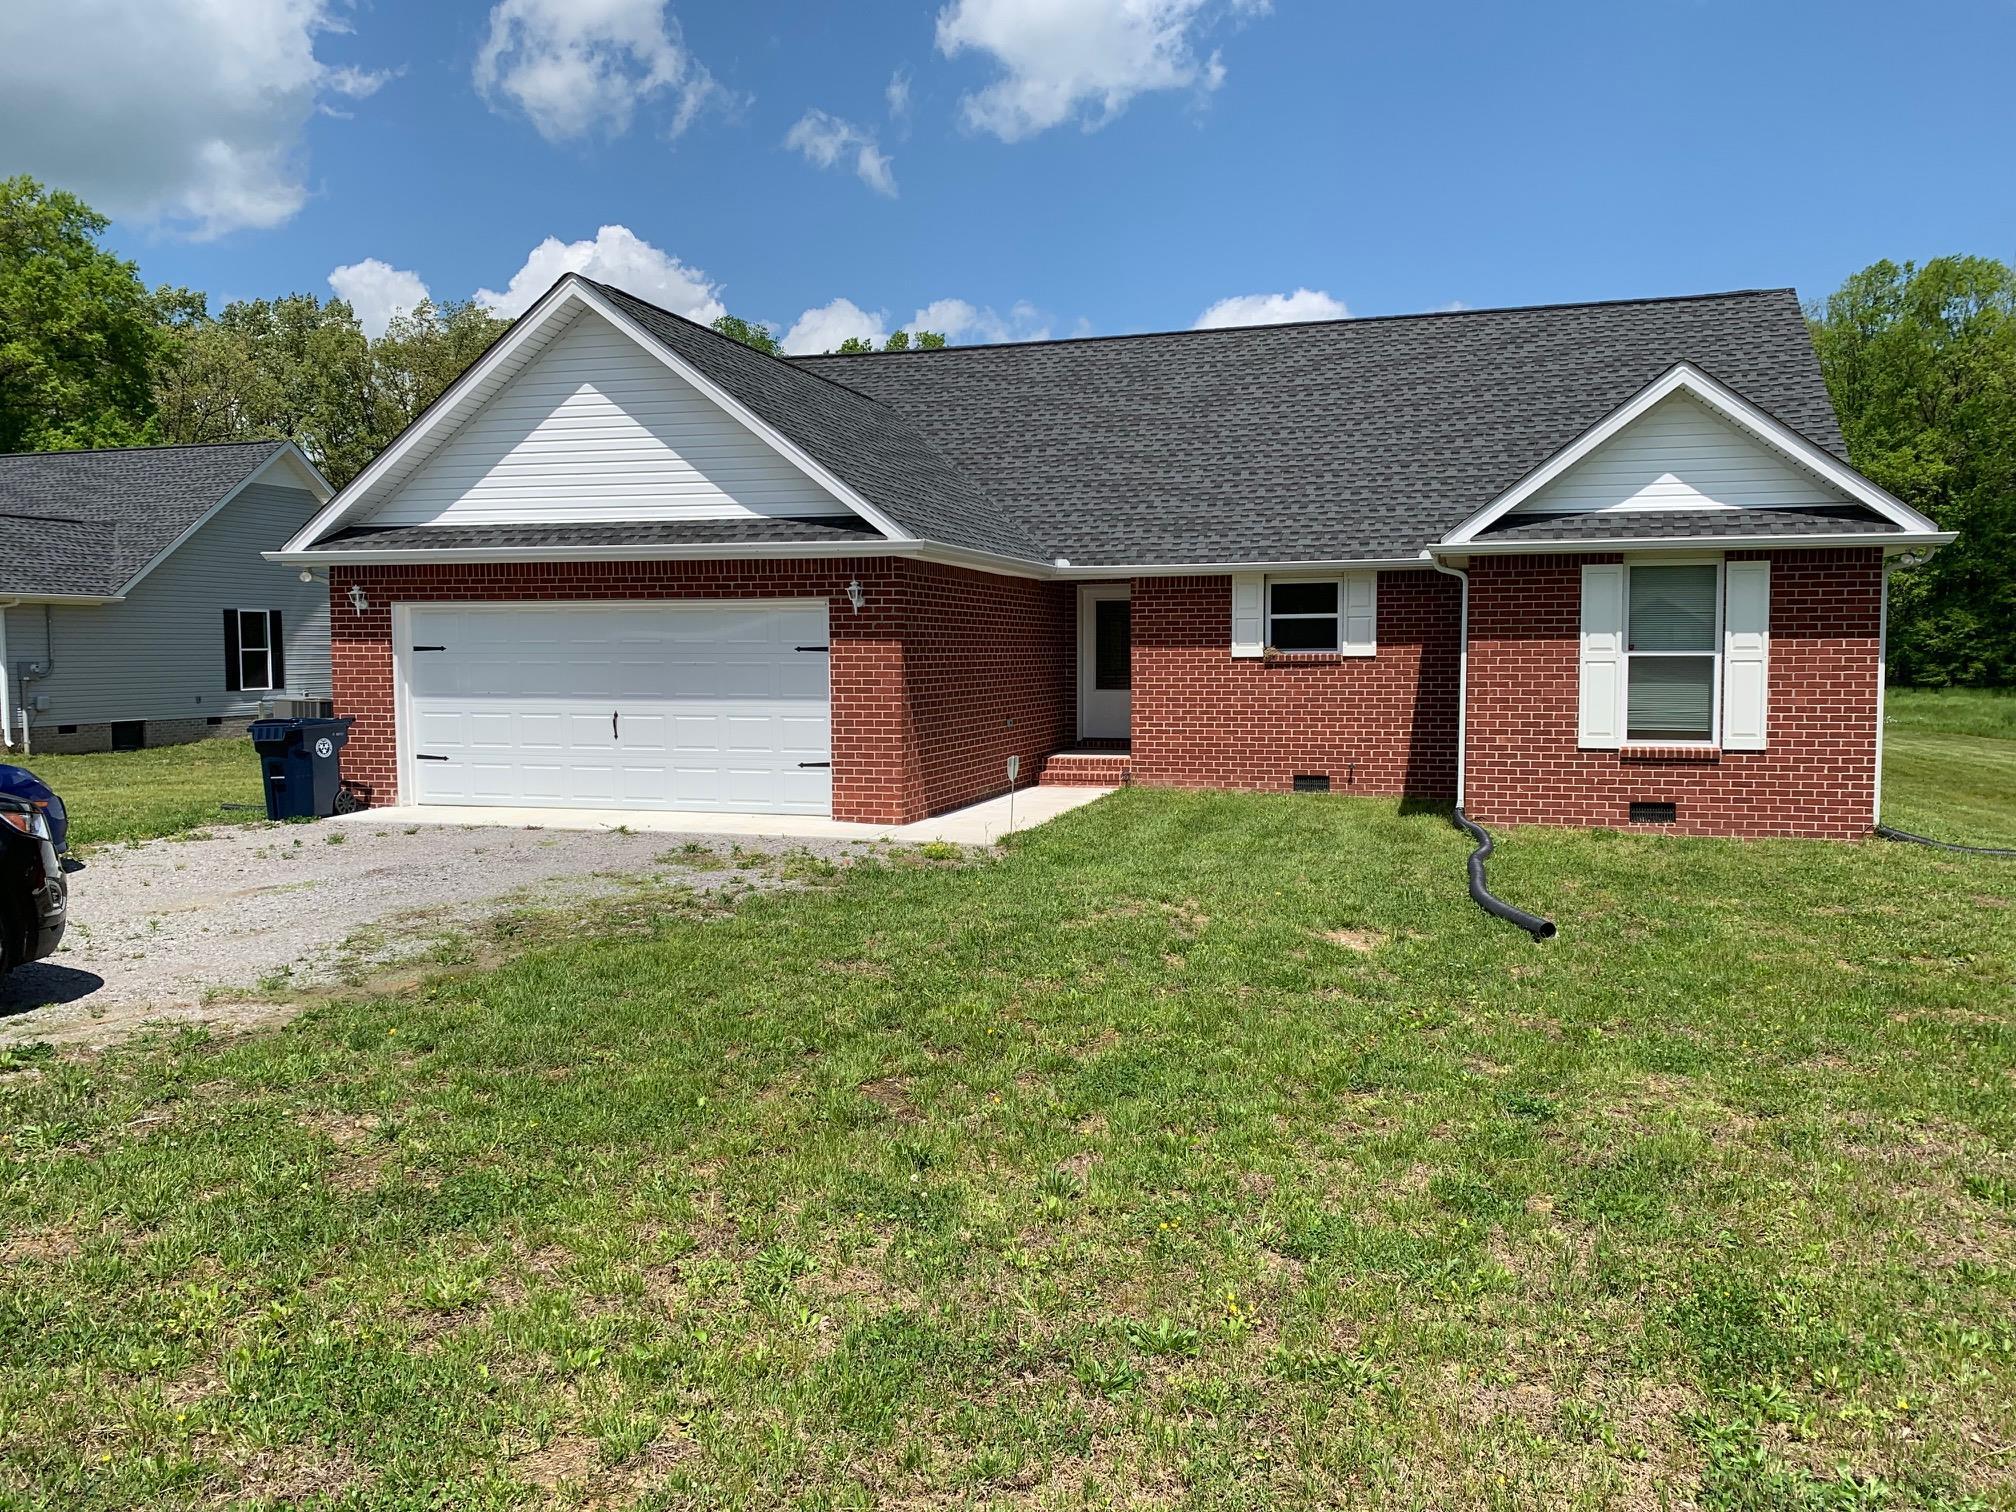 500 Green Meadows Dr, Smithville, TN 37166 - Smithville, TN real estate listing